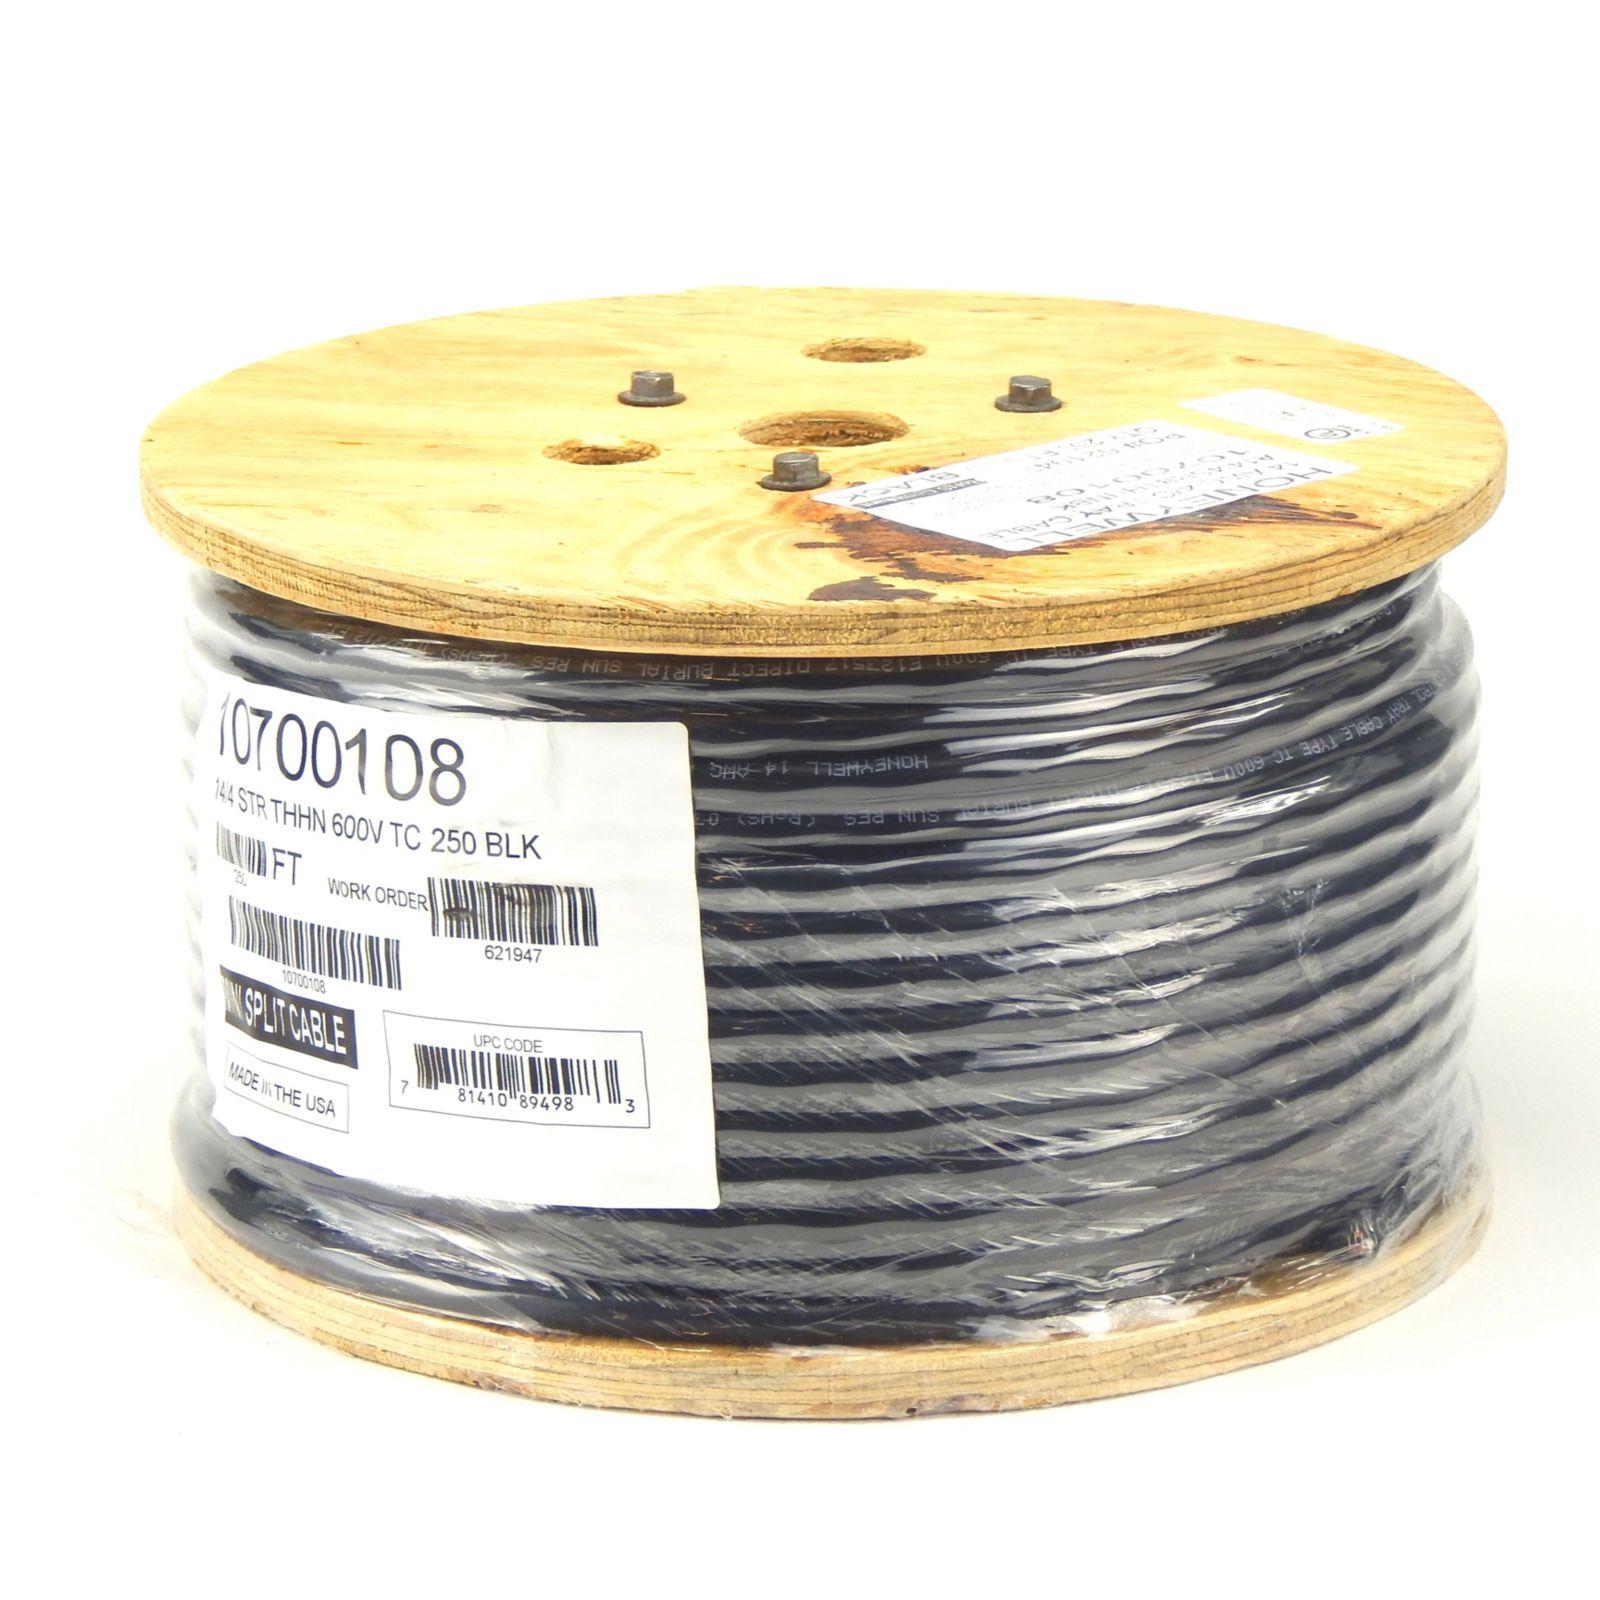 14/4 Stranded Non-Shielded Minisplit Wire Cable - Black - 250\'